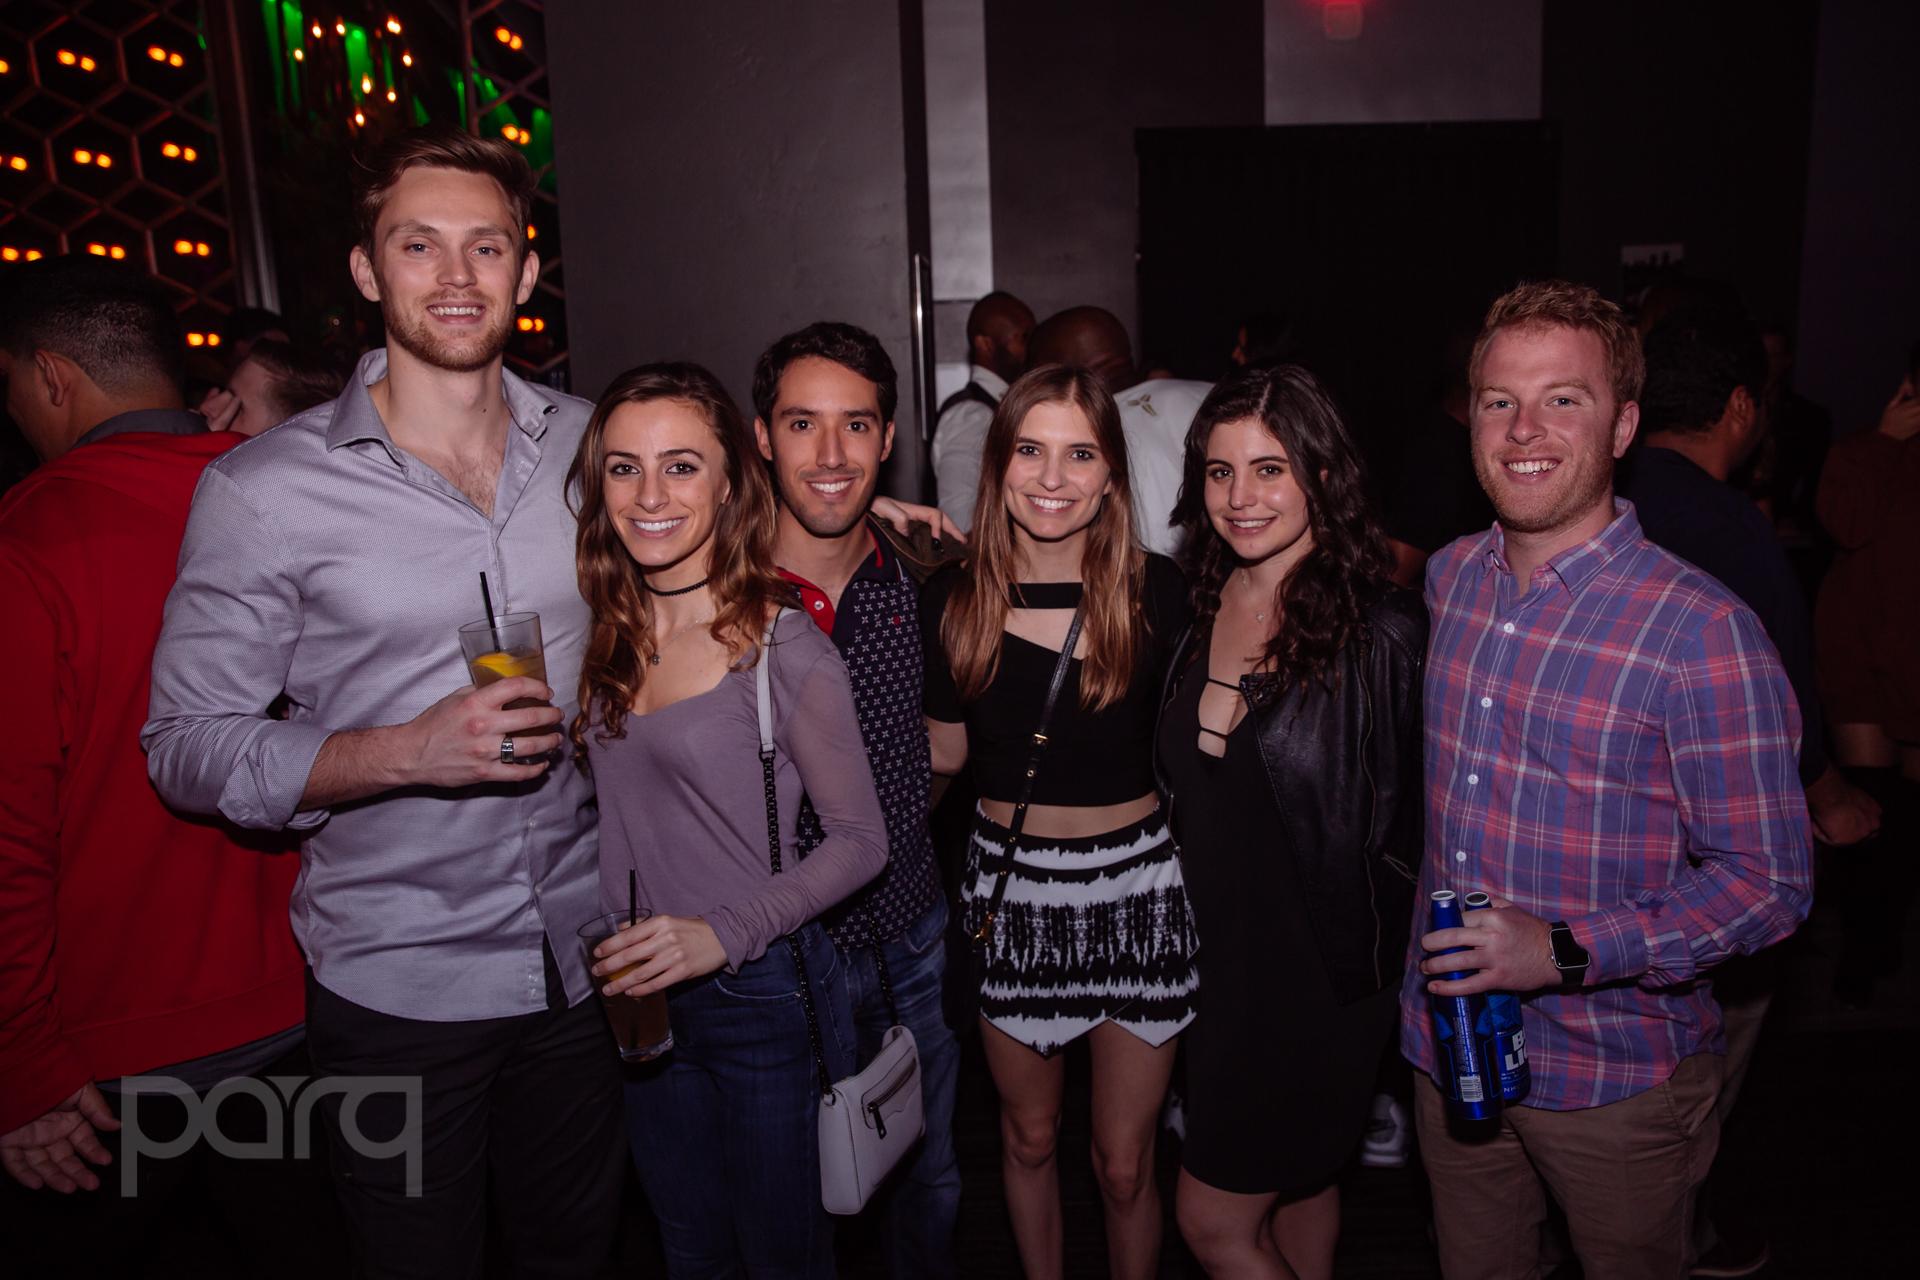 San-Diego-Nightclub-Zoo Funktion-22.jpg